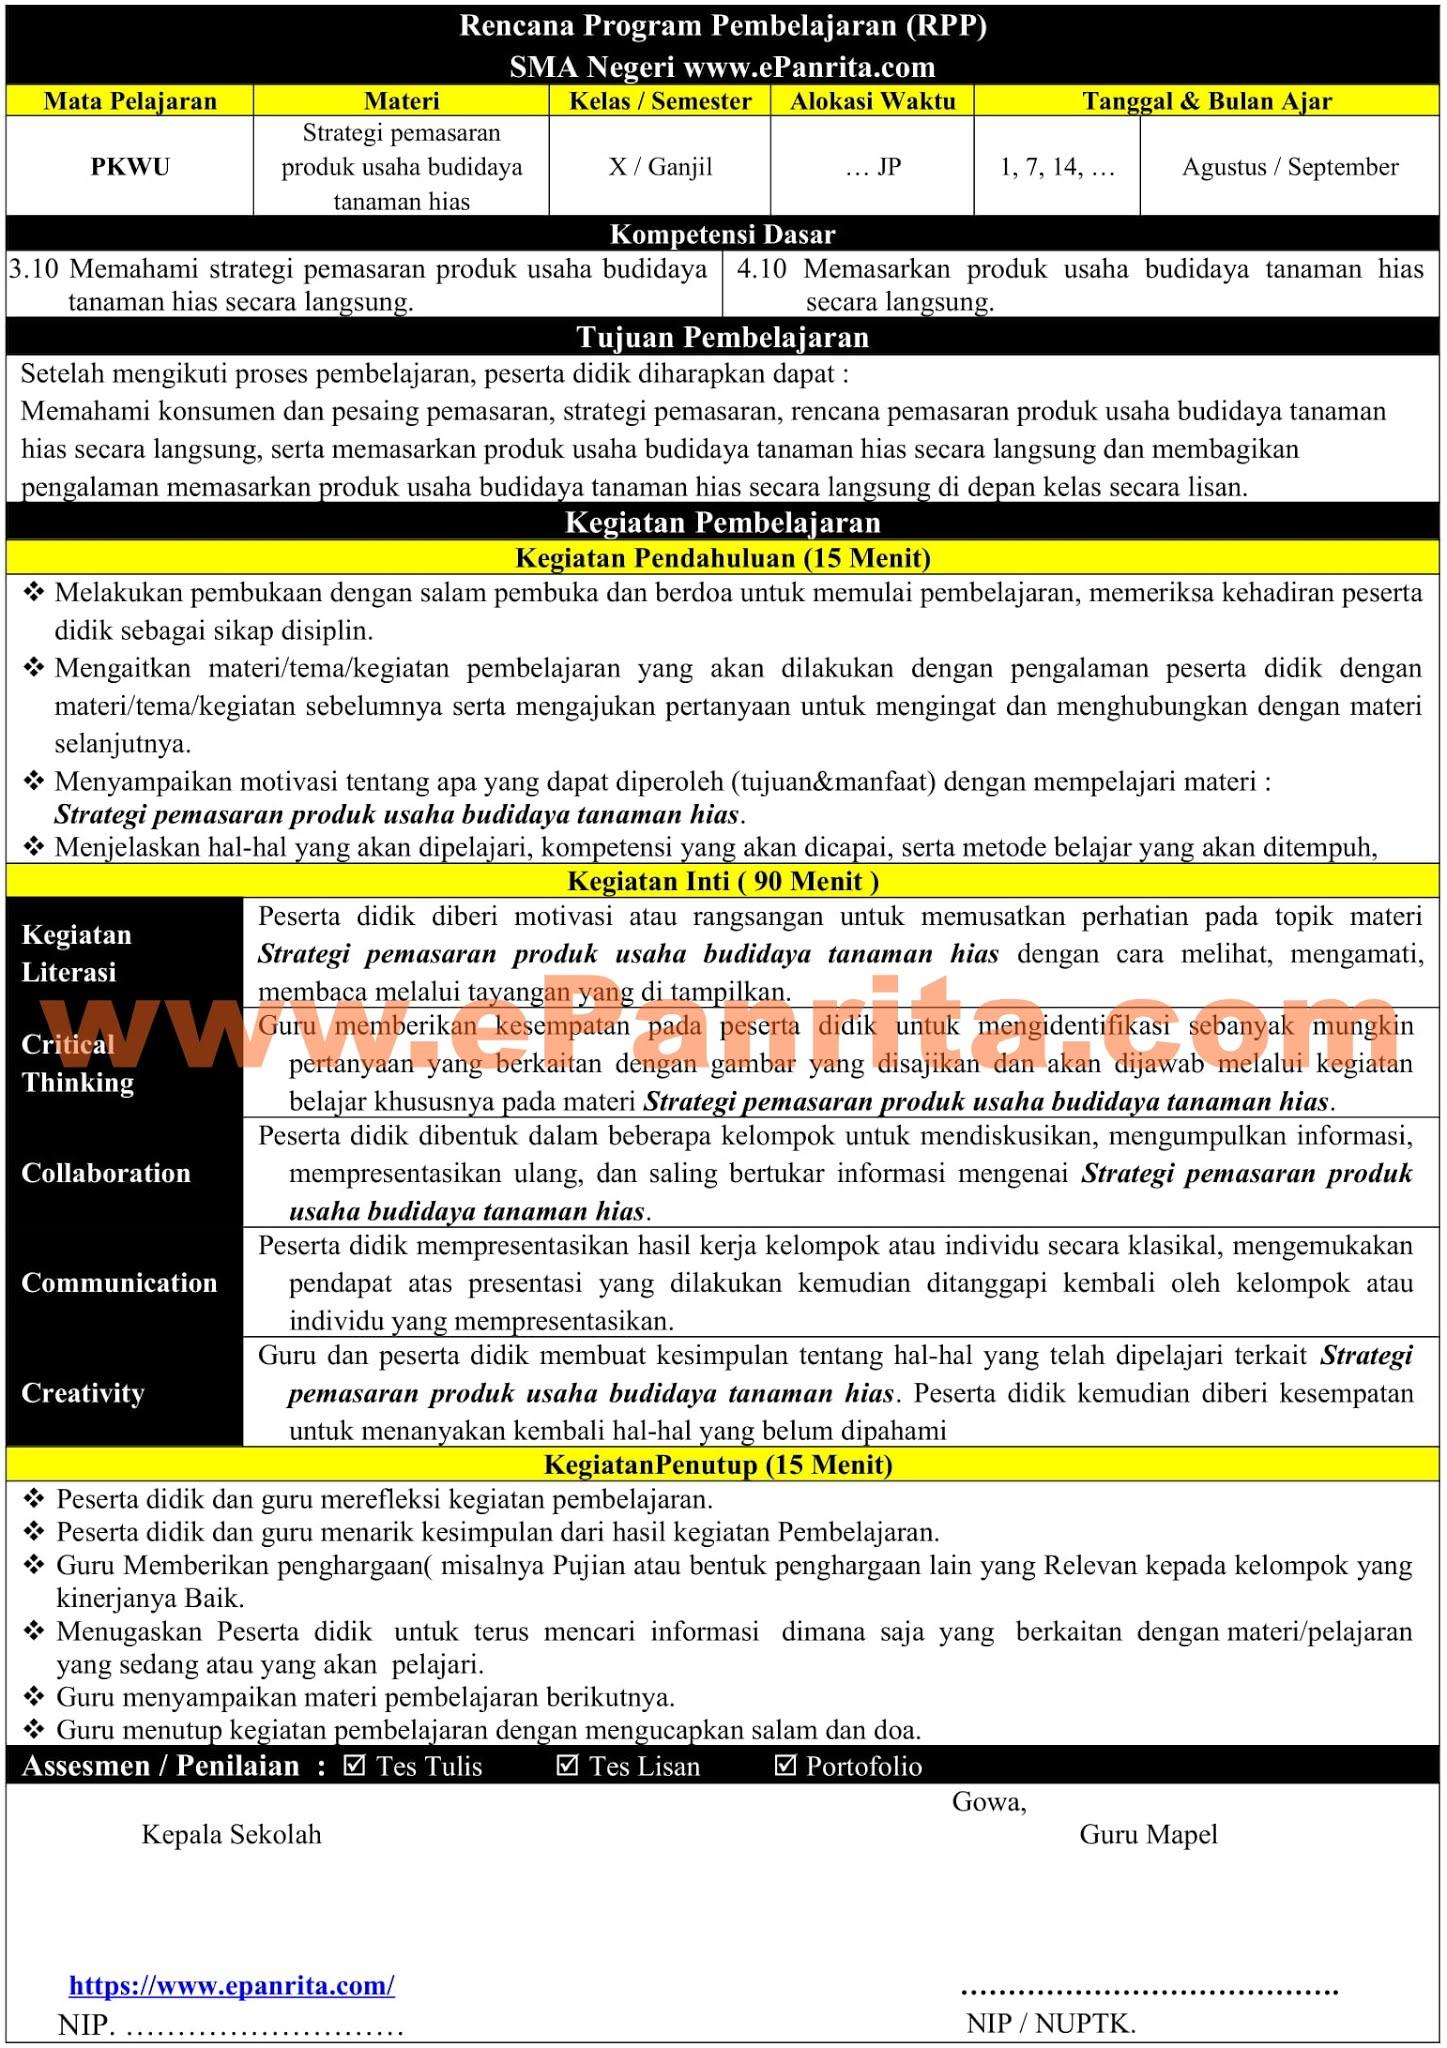 RPP 1 Halaman Prakarya Aspek Budidaya (Strategi pemasaran produk usaha budidaya tanaman hias)